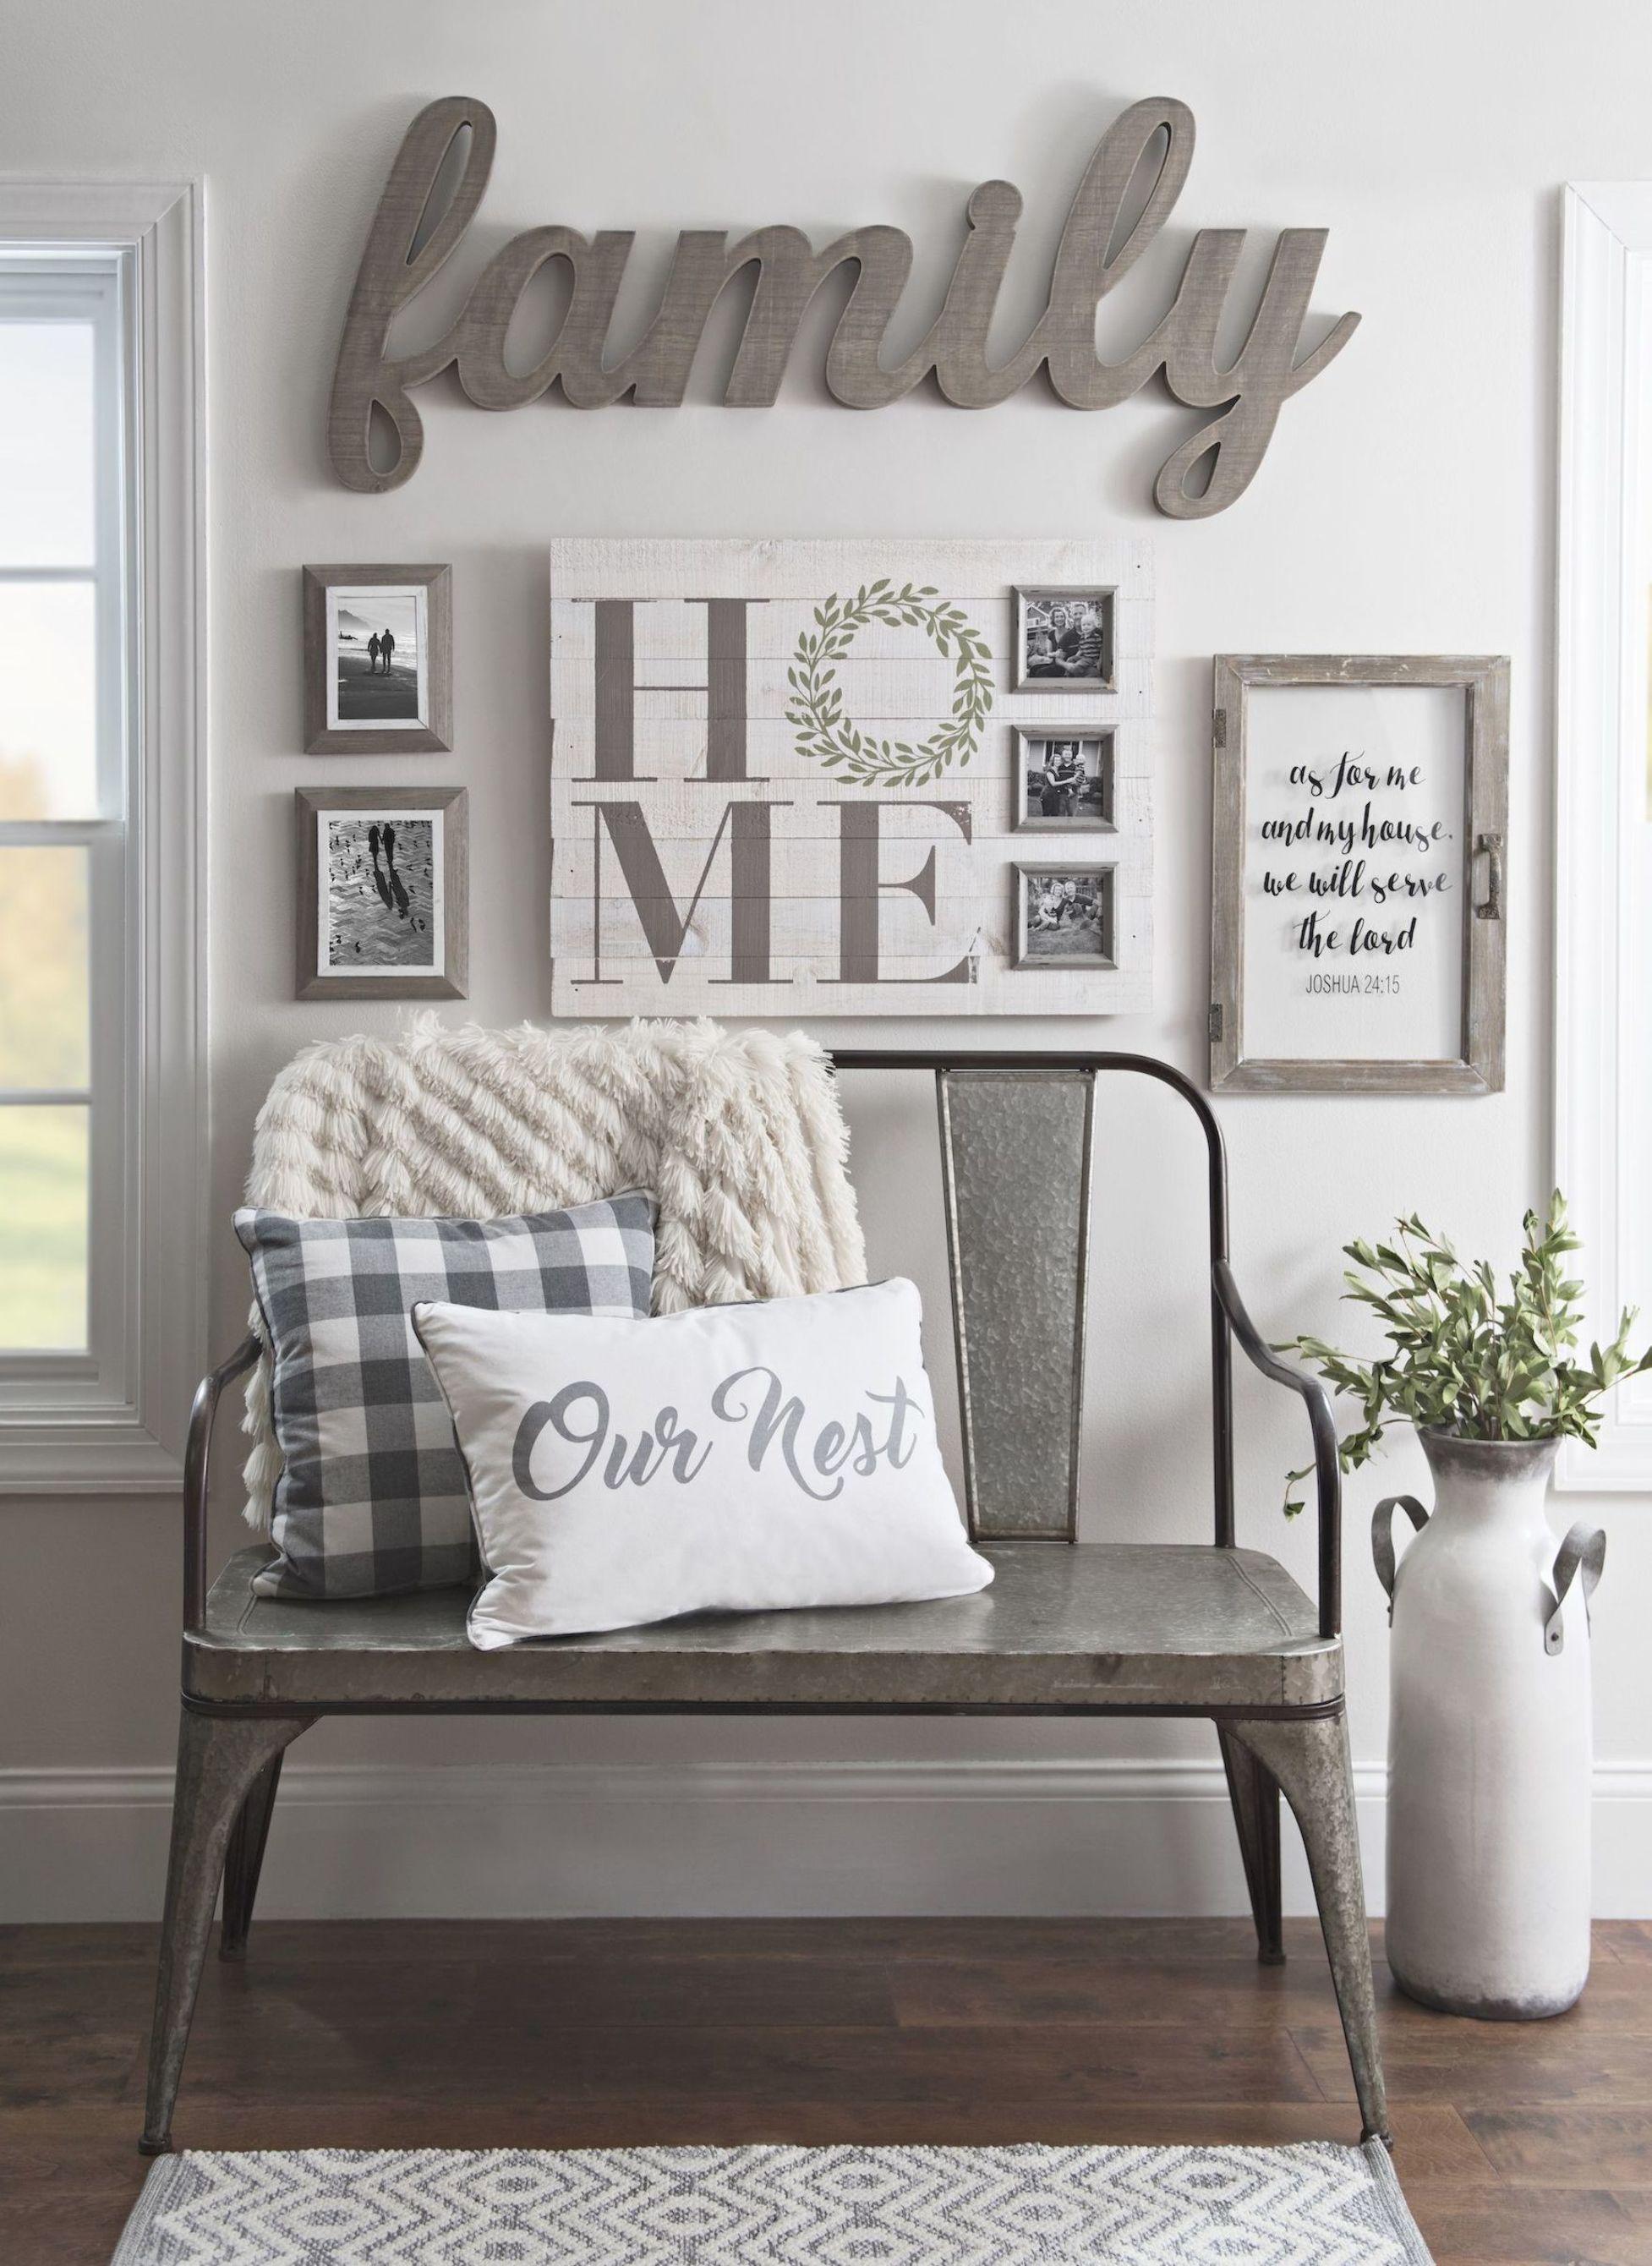 25 Easy Home Decorating Ideas Wall Decor Living Room Cheap Apartment Decorating Farmhouse Decor Living Room